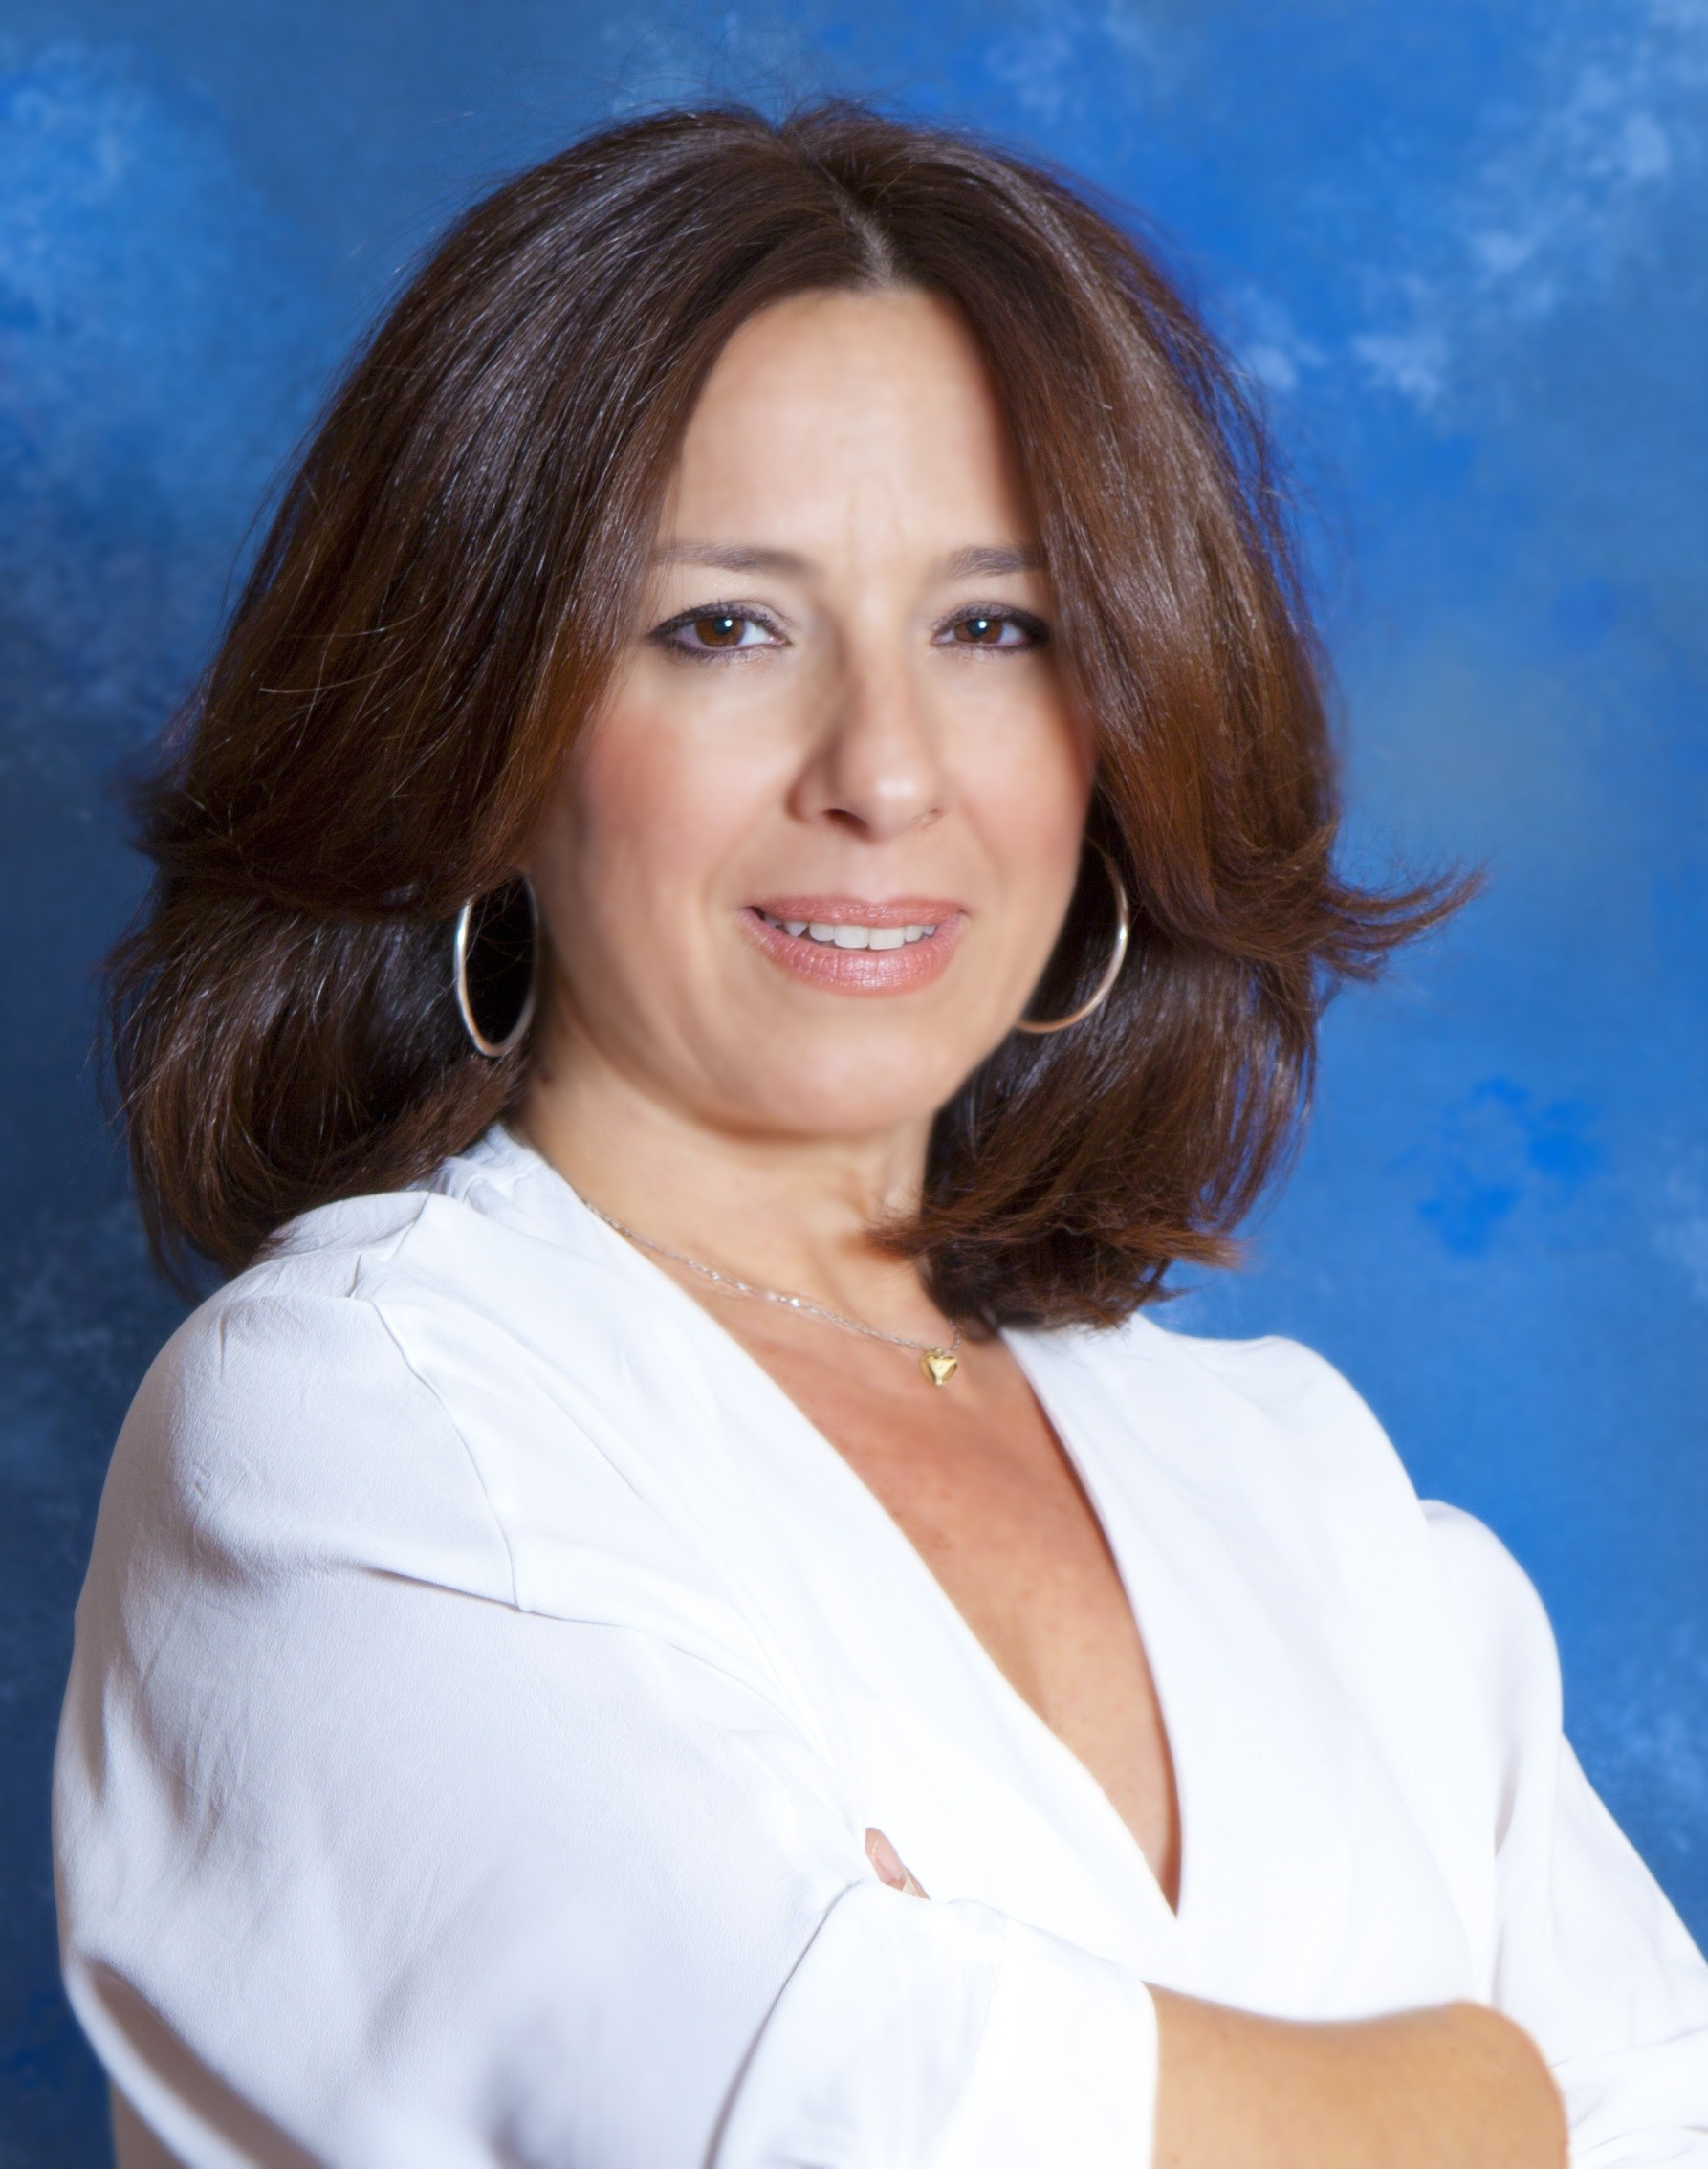 Marta Sánchez-Paus Hernández